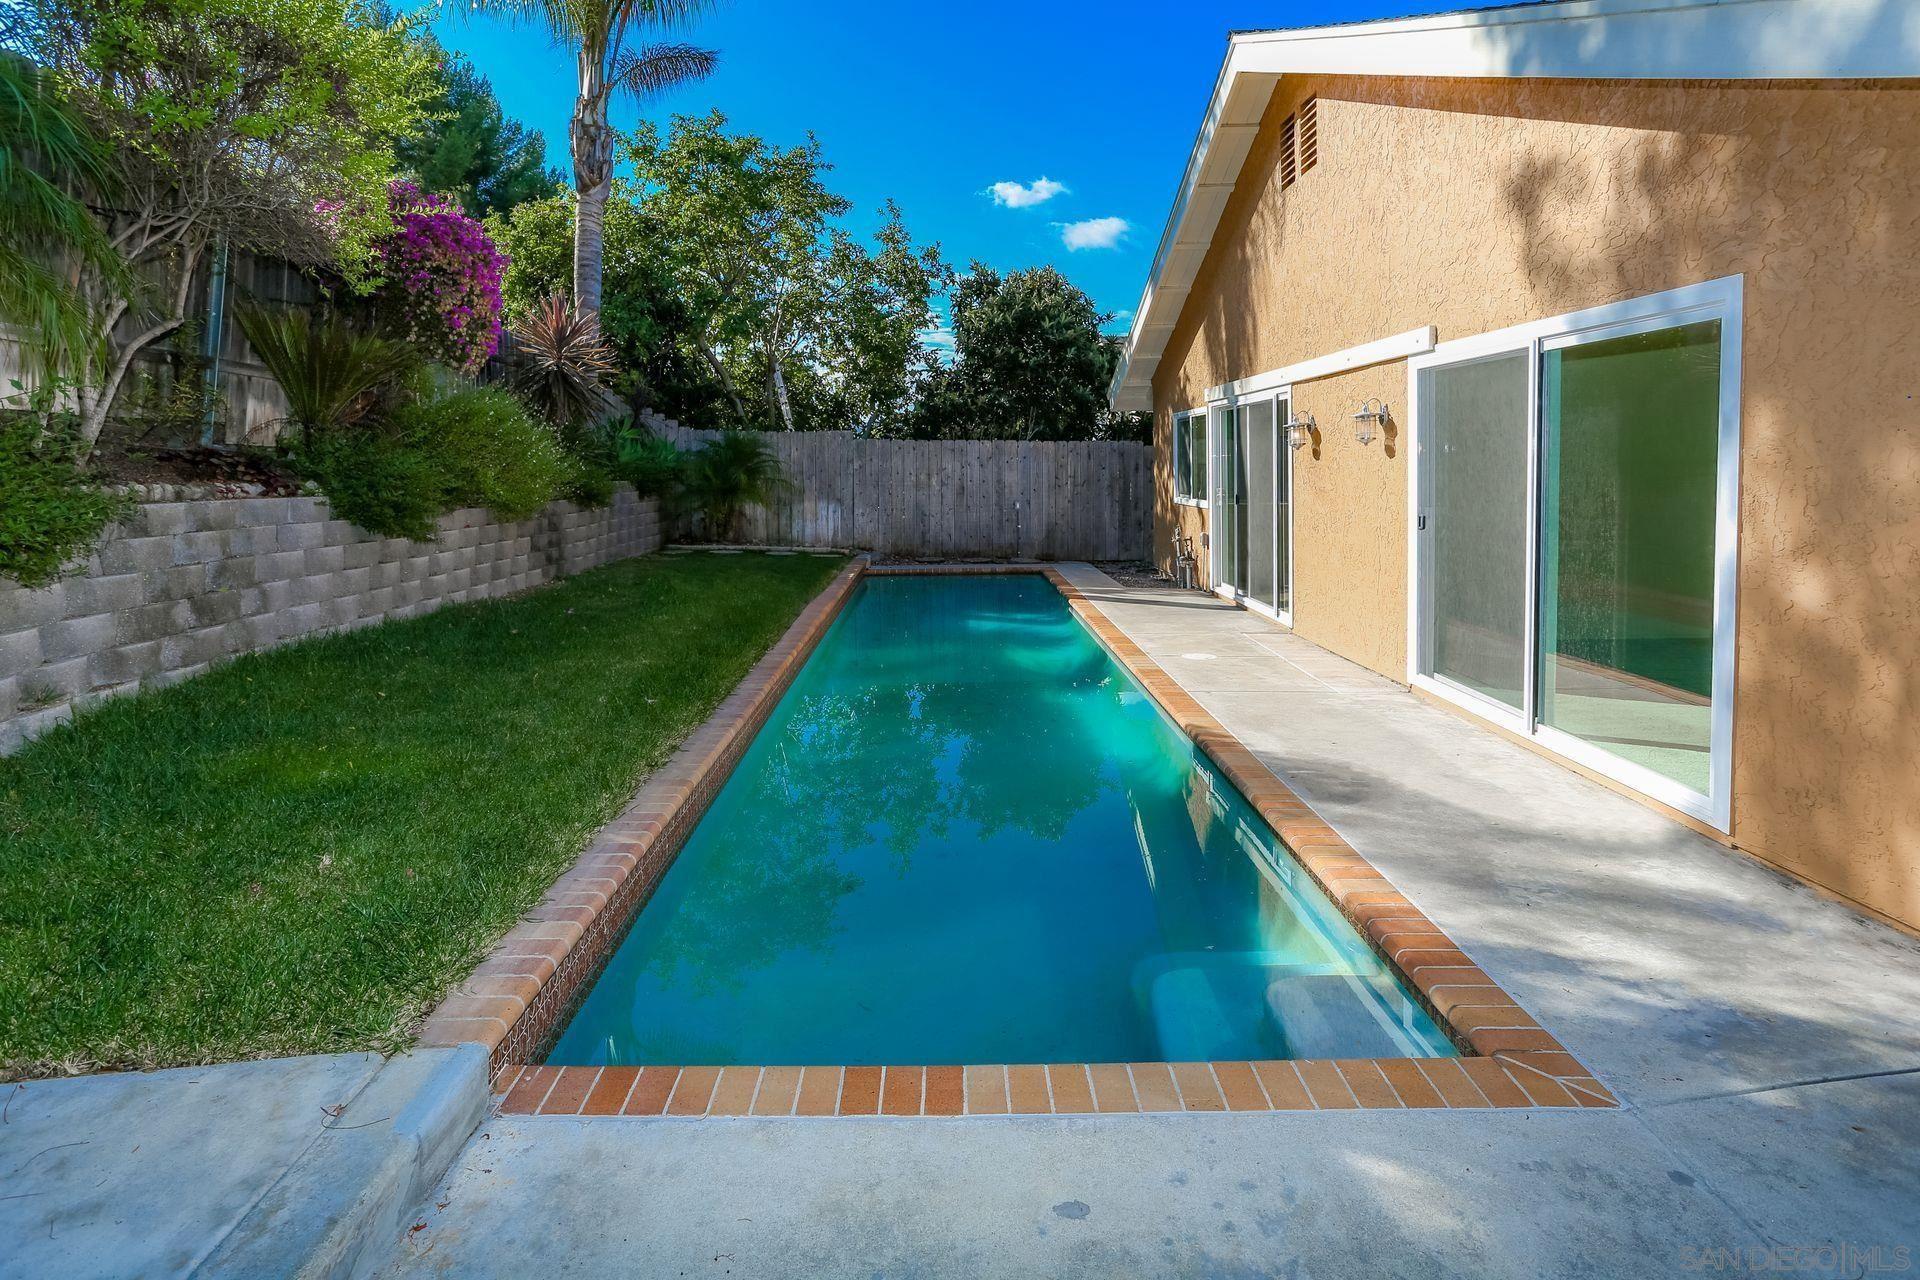 Photo of 10683 Villa Bonita, Spring Valley, CA 91978 (MLS # 210028623)